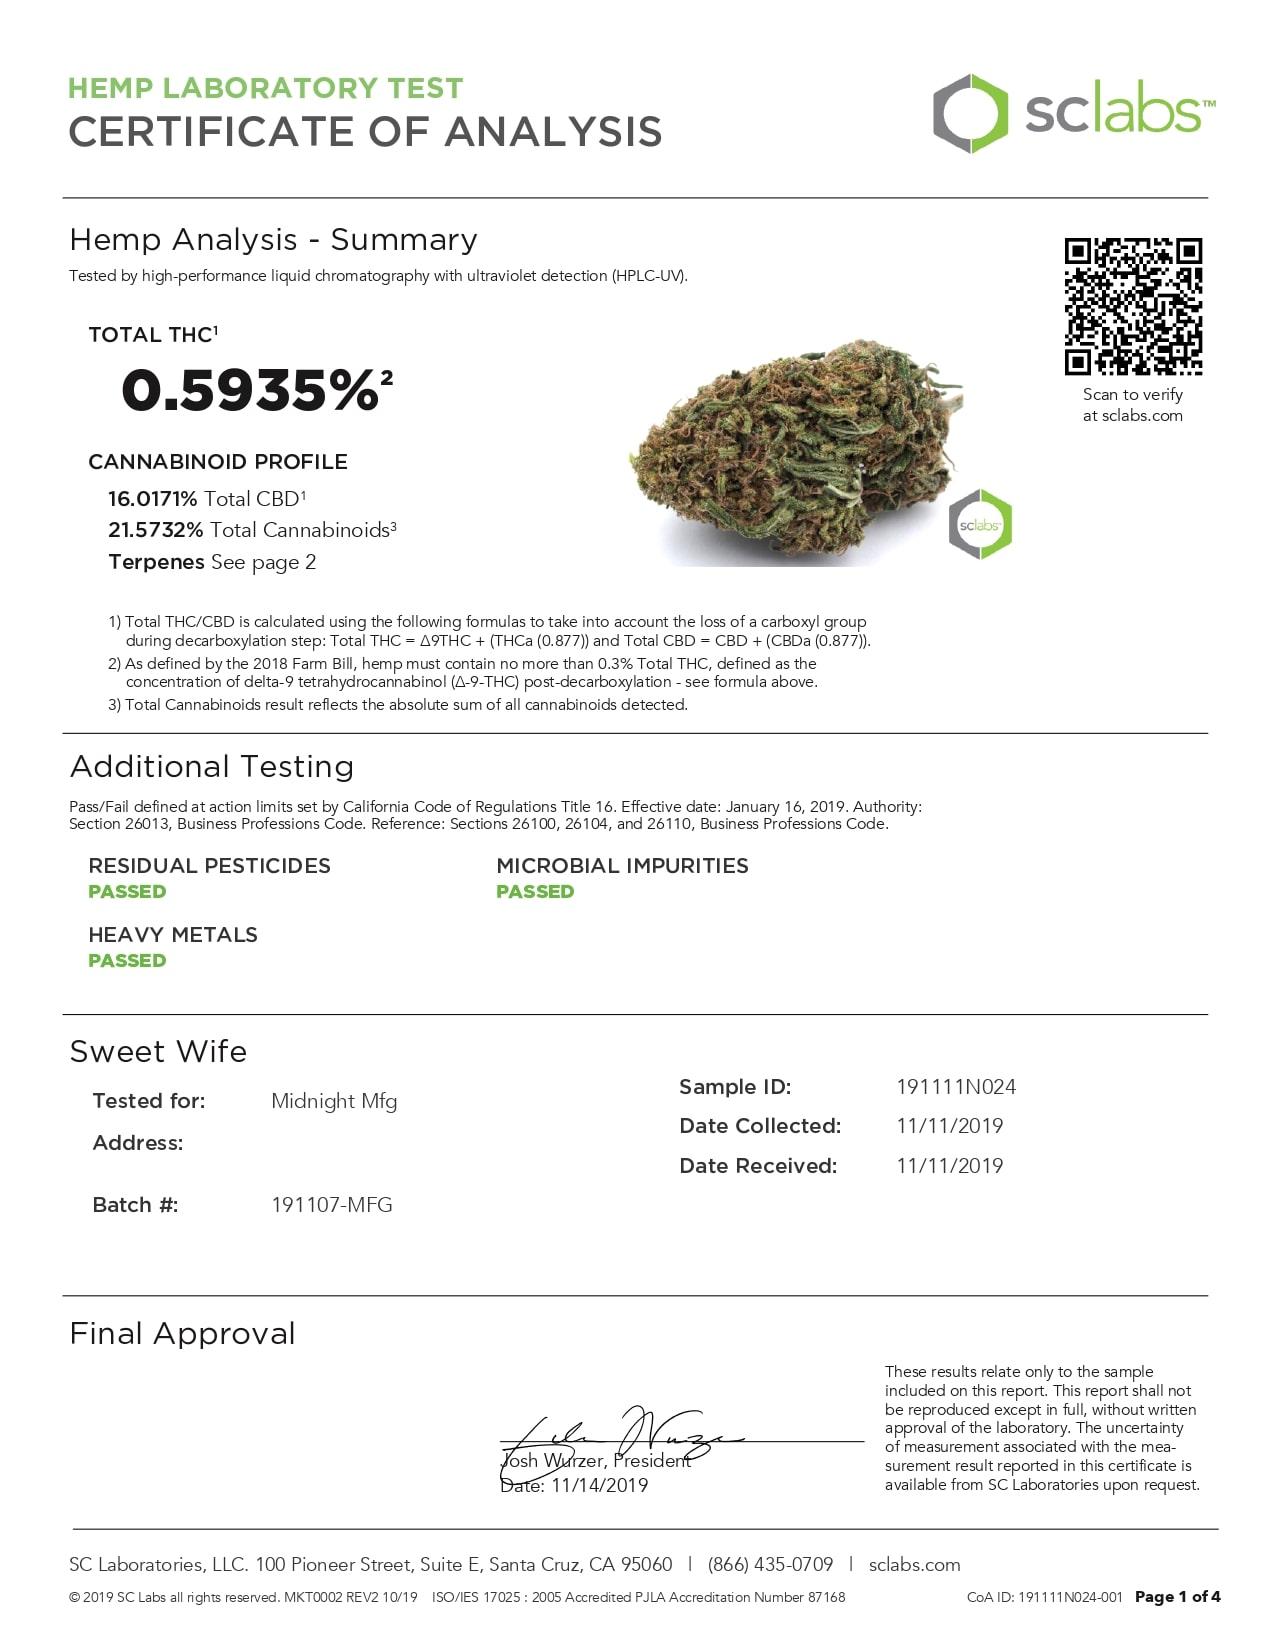 CANNA RIVER CBD Sweet Wife Lab Report Hemp Flower